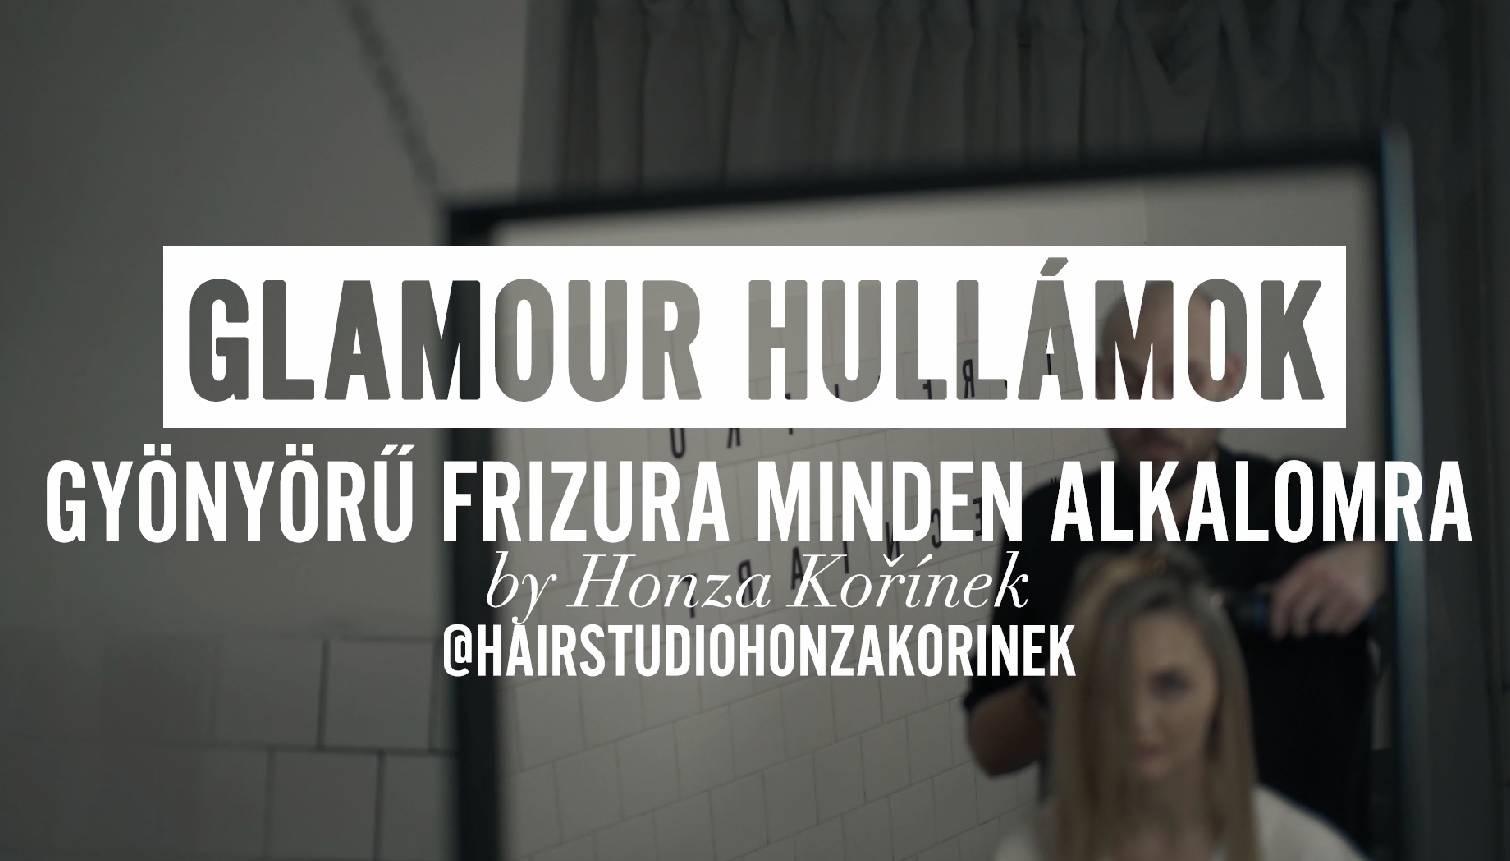 <center><strong>Glamour hullámok</strong></center>